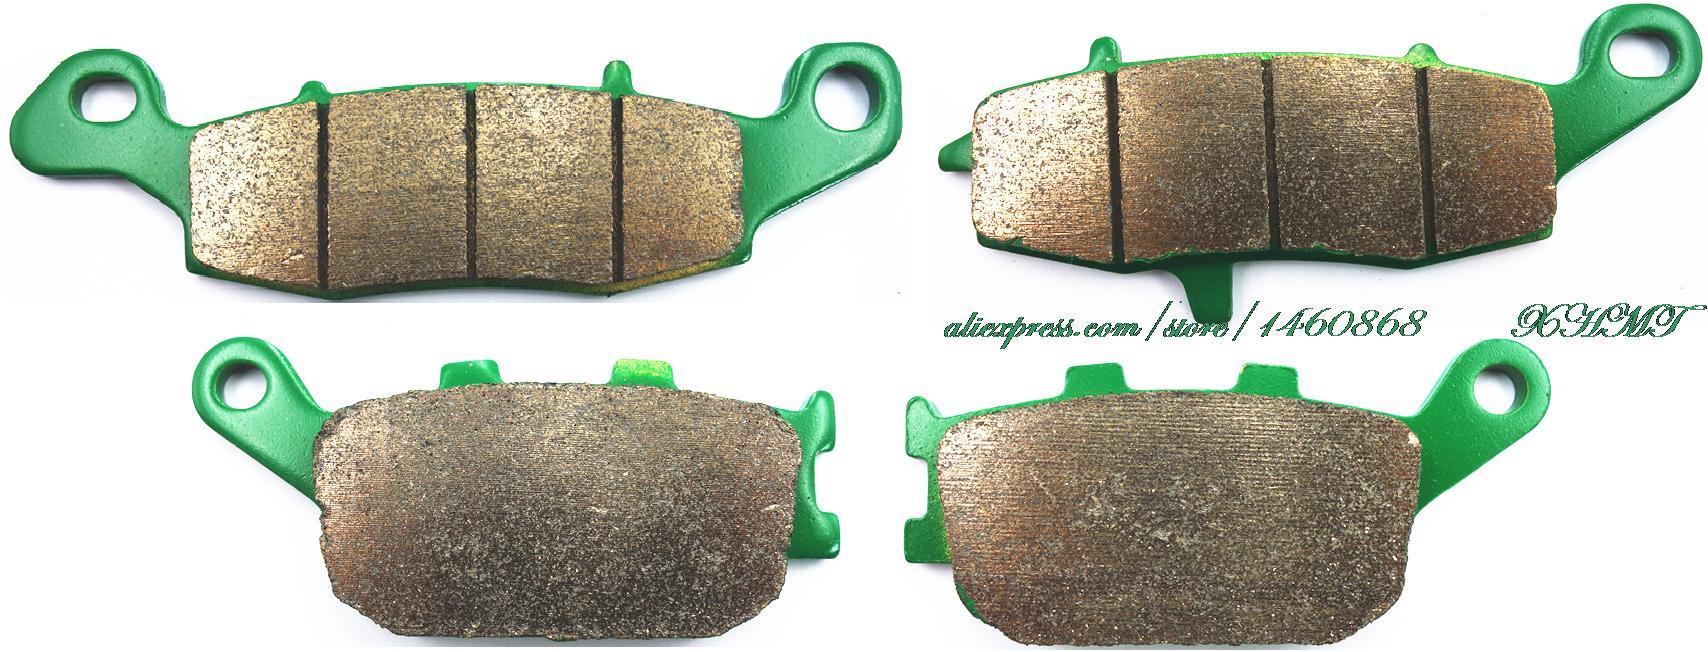 Brake Pad Set for SUZUKI XF 650 FREEWIND 1997 1998 1999 2000 2001 2002